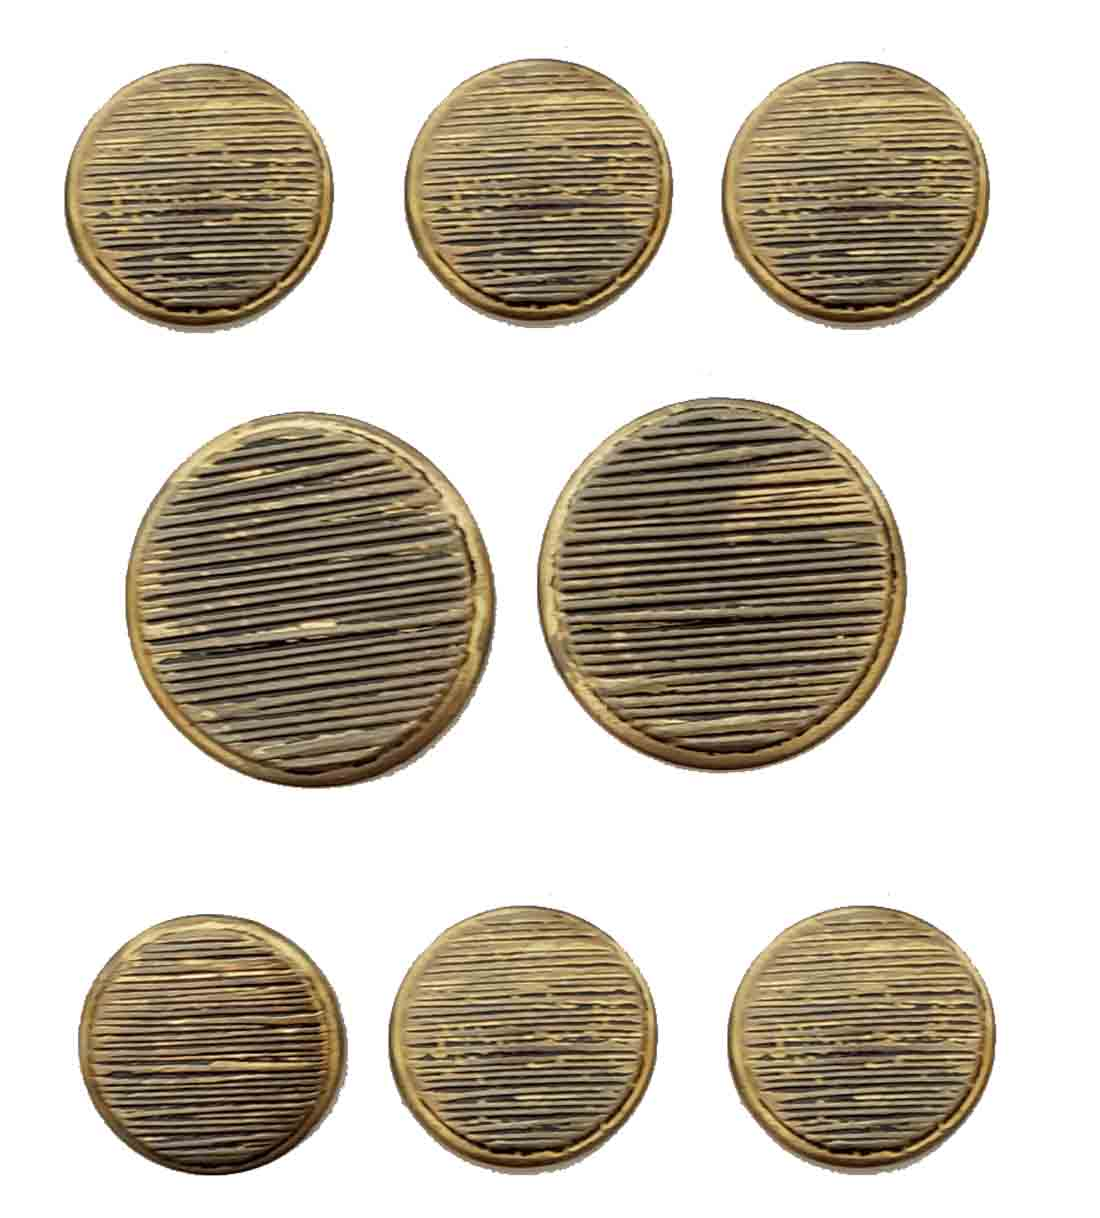 Vintage Haggar Blazer Buttons Antique Gold Gray Shank Brass Men's